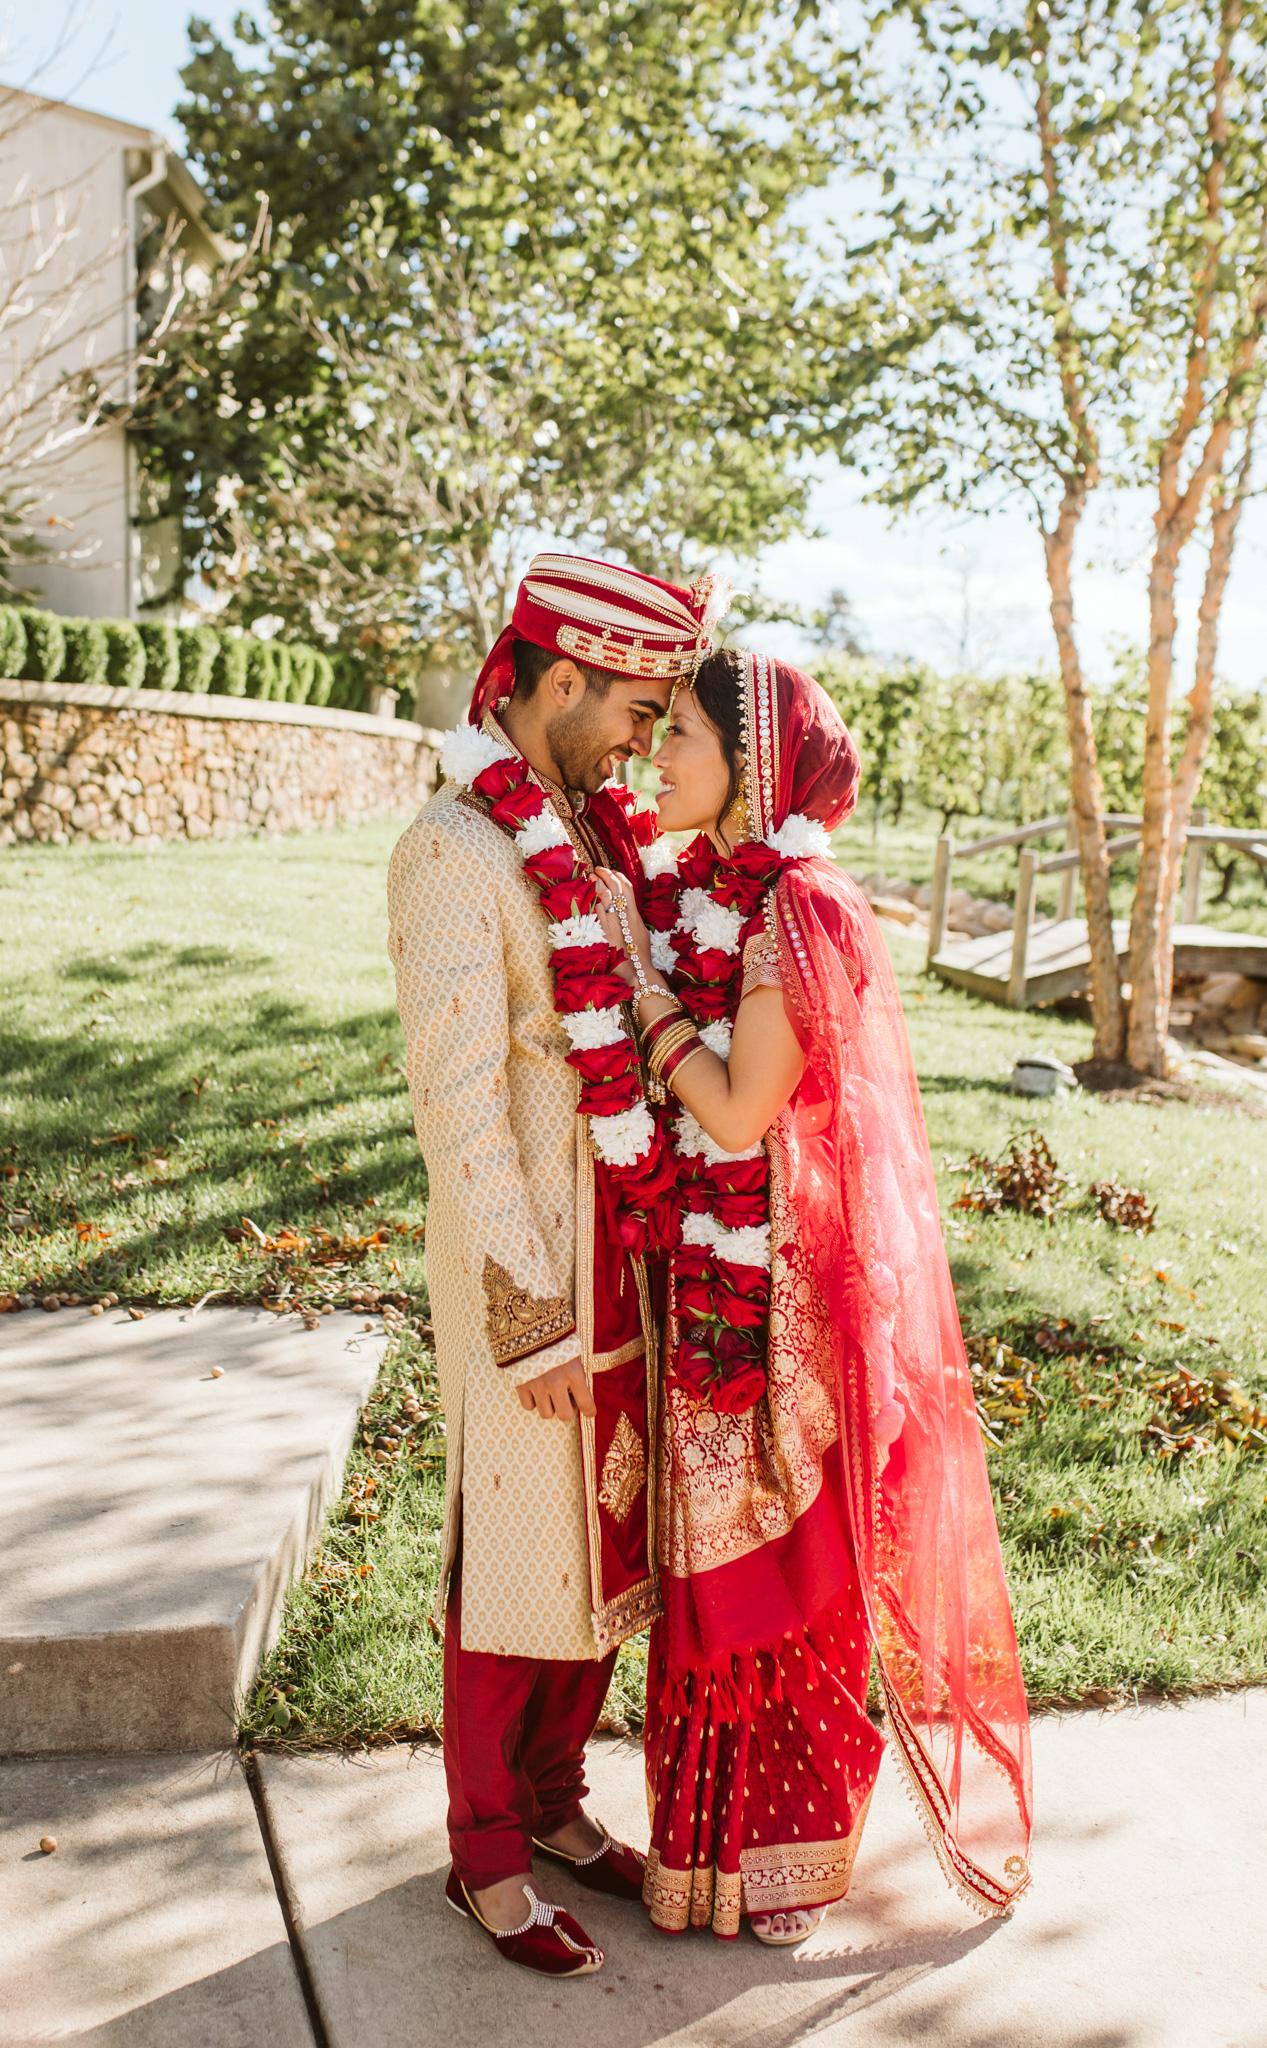 rebeccaburtphotography.hindiwedding.moraisvineyards.virginiawedding-147.JPG